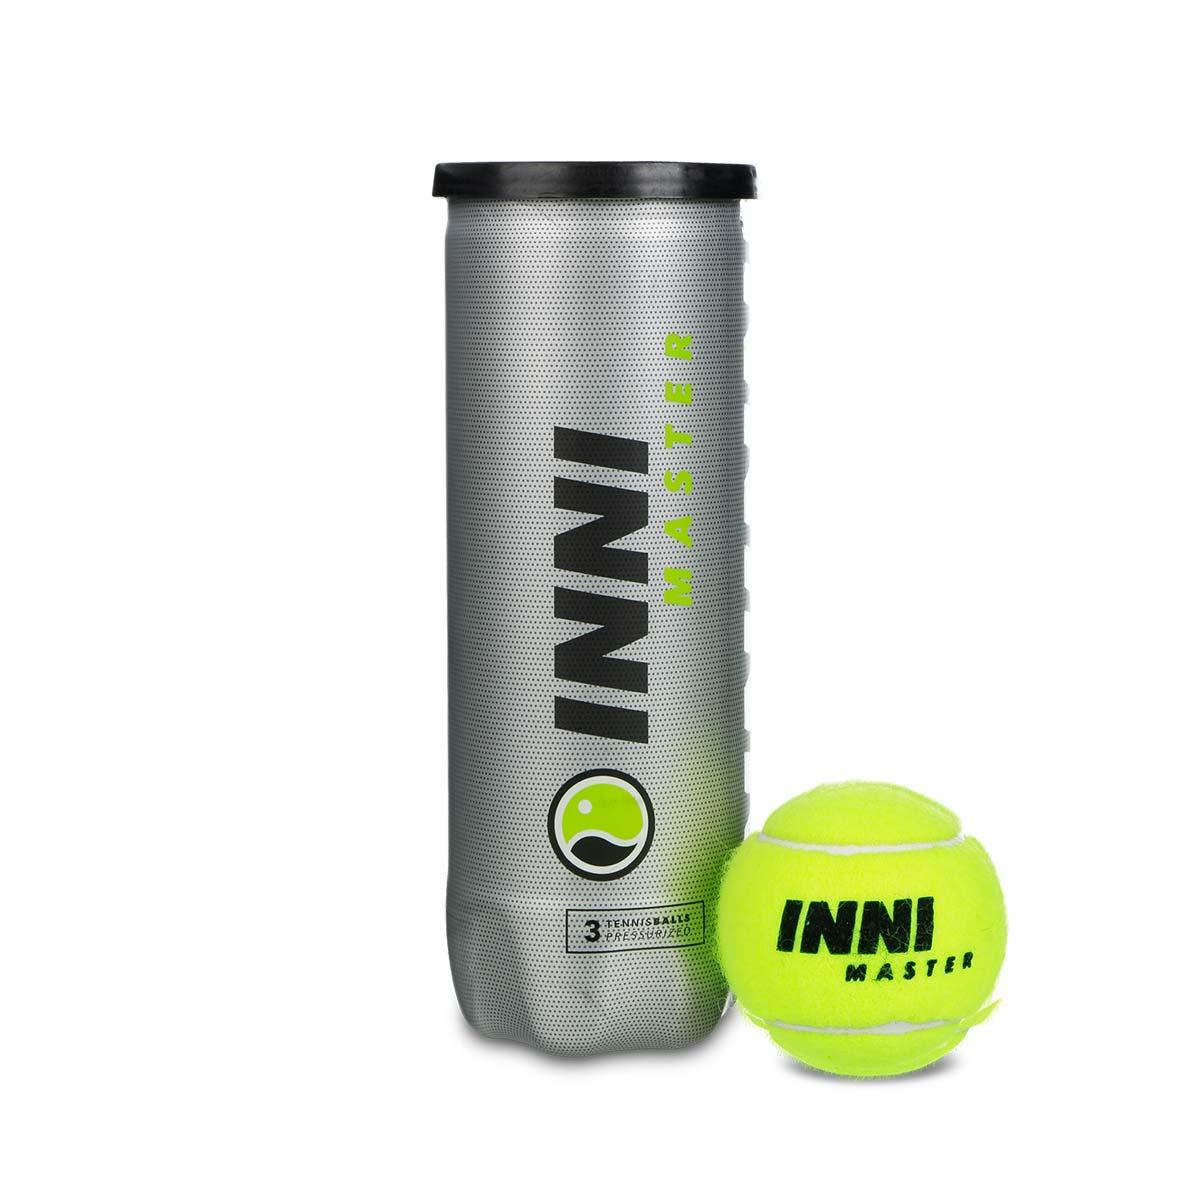 Bola de Tênis Inni Master - Tubo